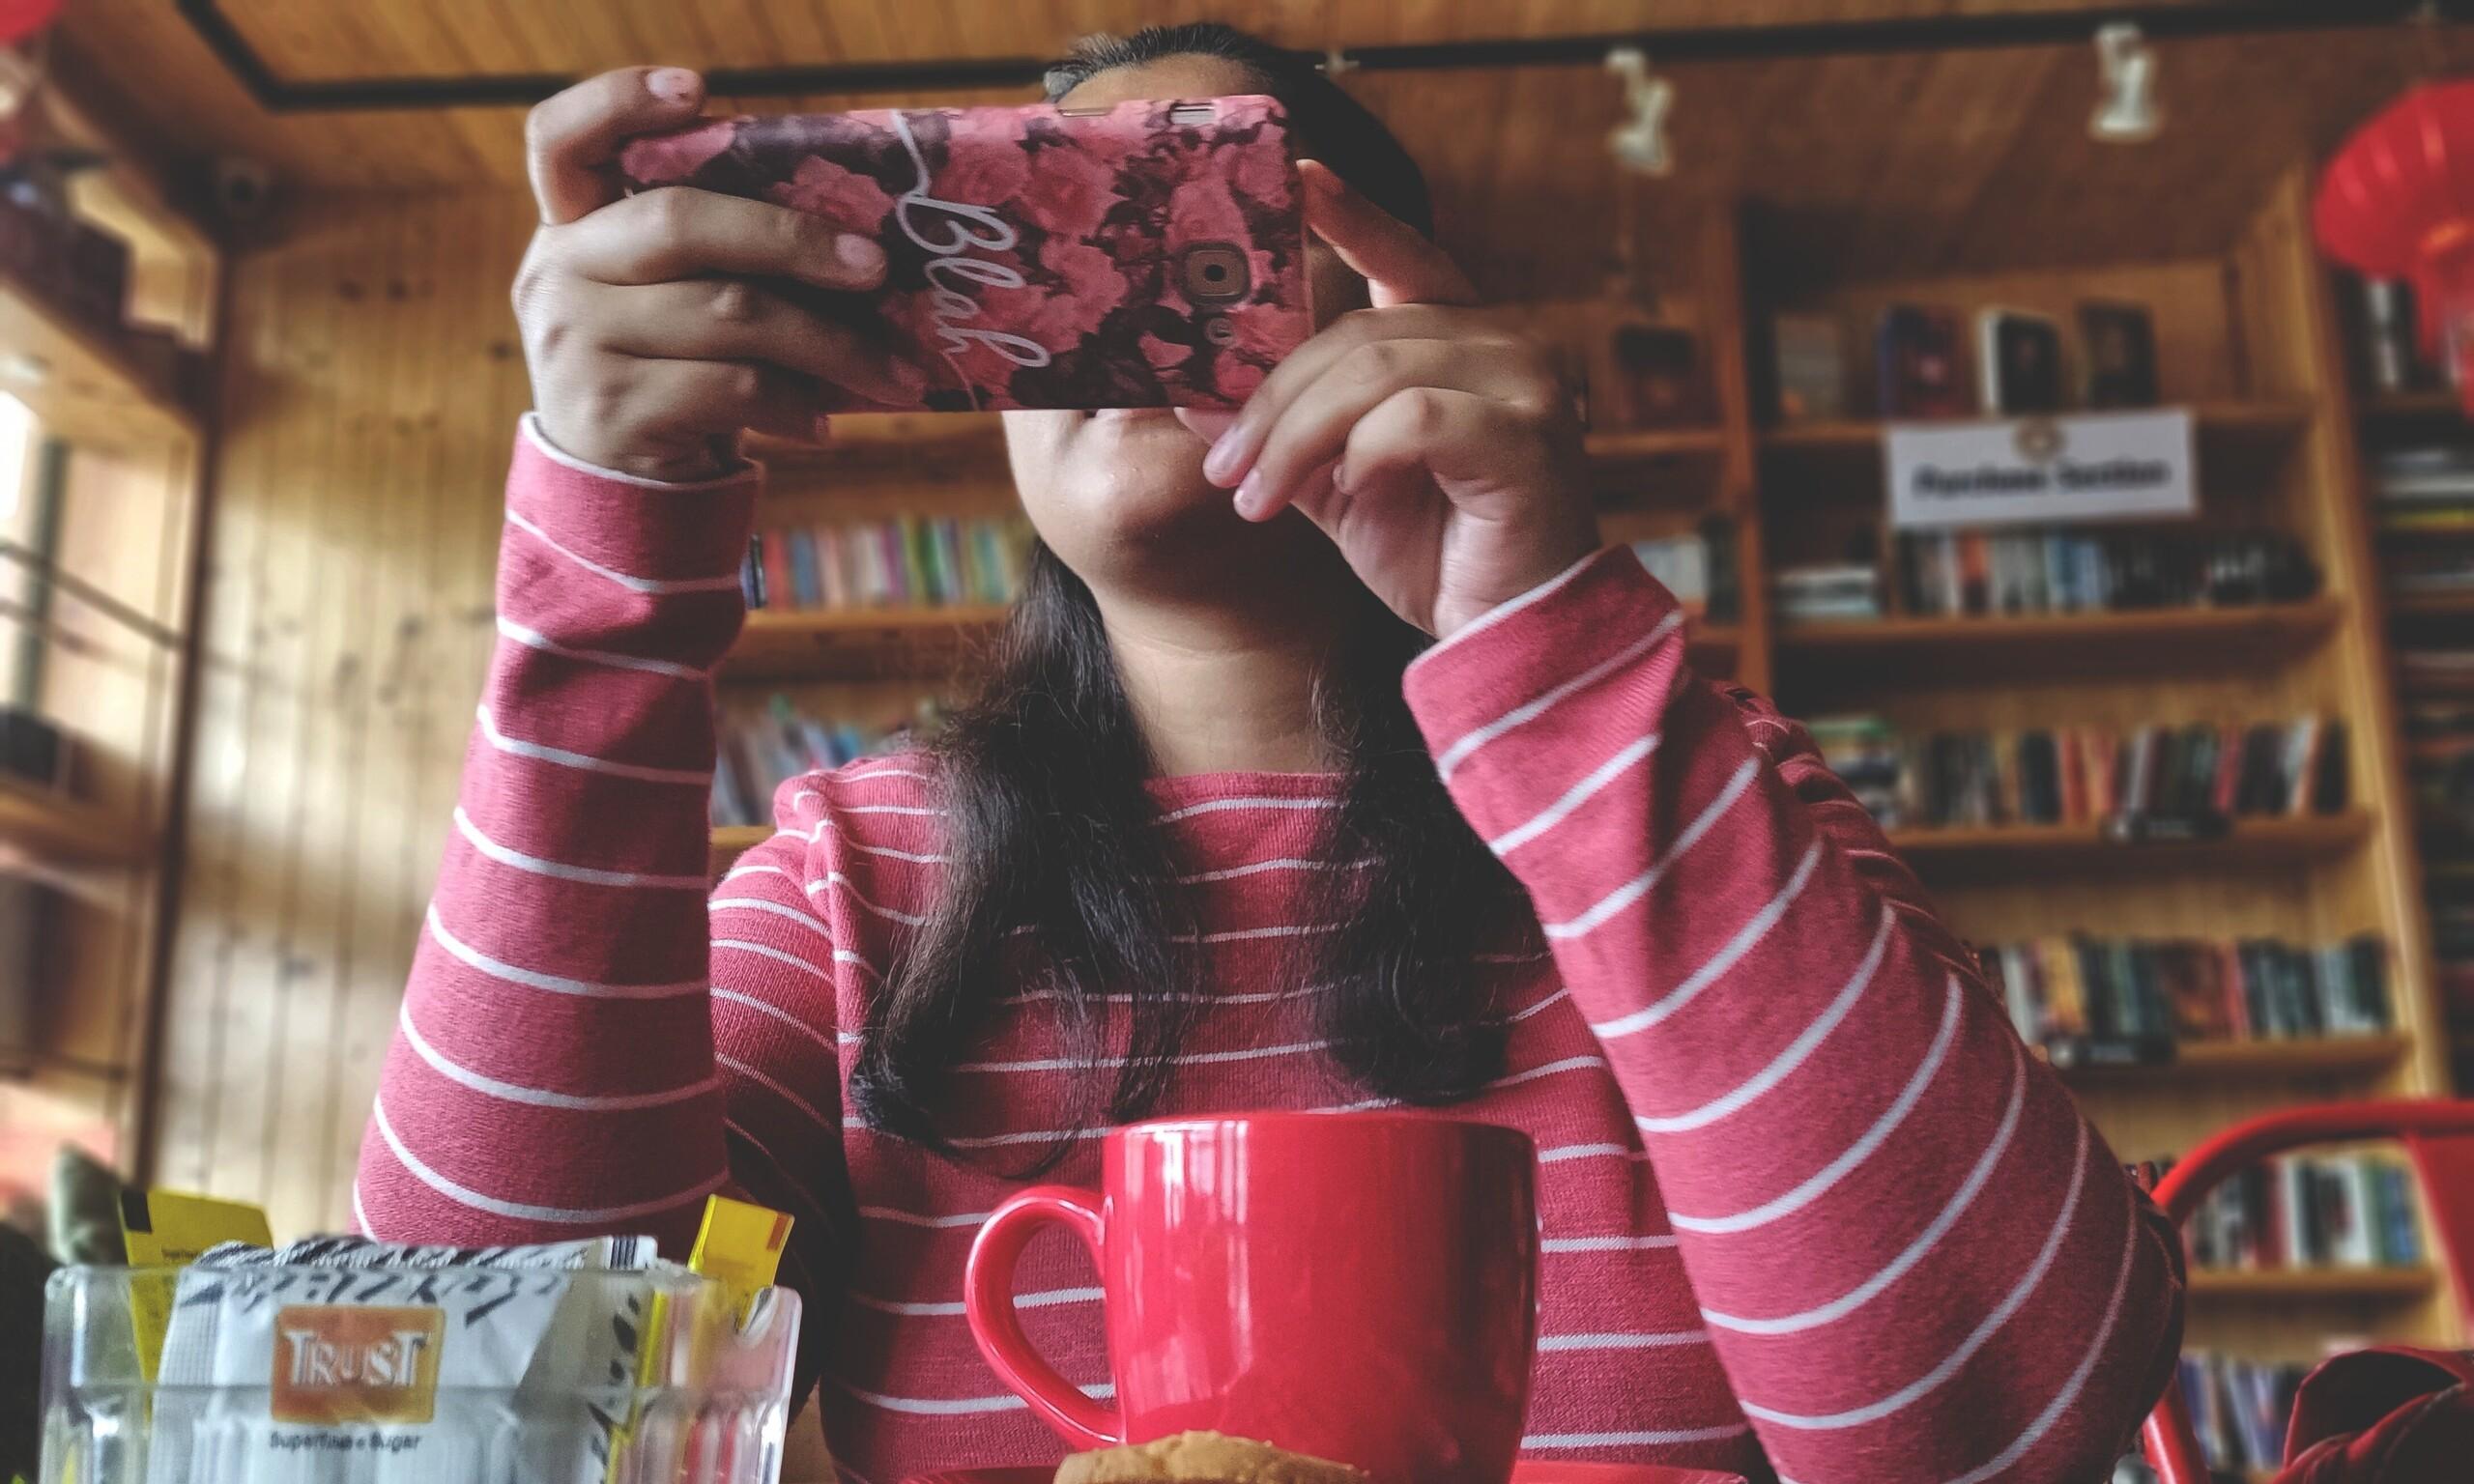 Frau fotografiert mit Smartphone.